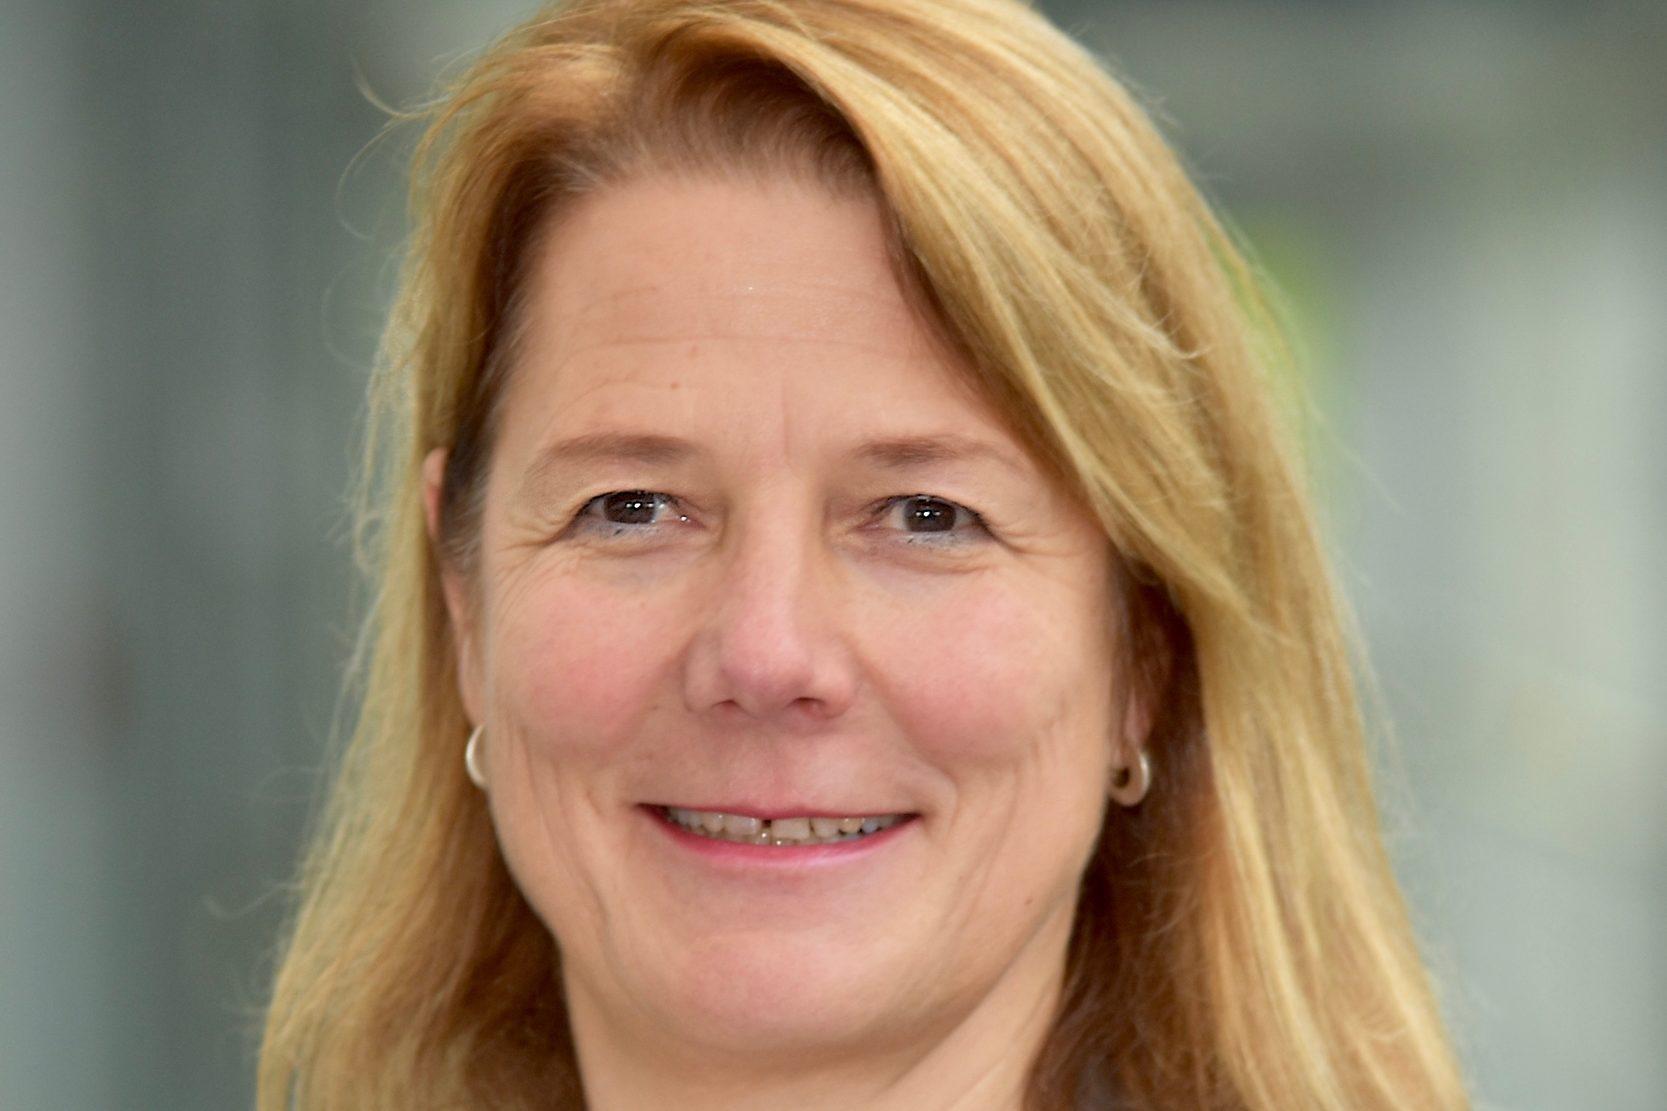 Claudia Benthake ist Klinikmanagerin des Elisabethkrankenhauses